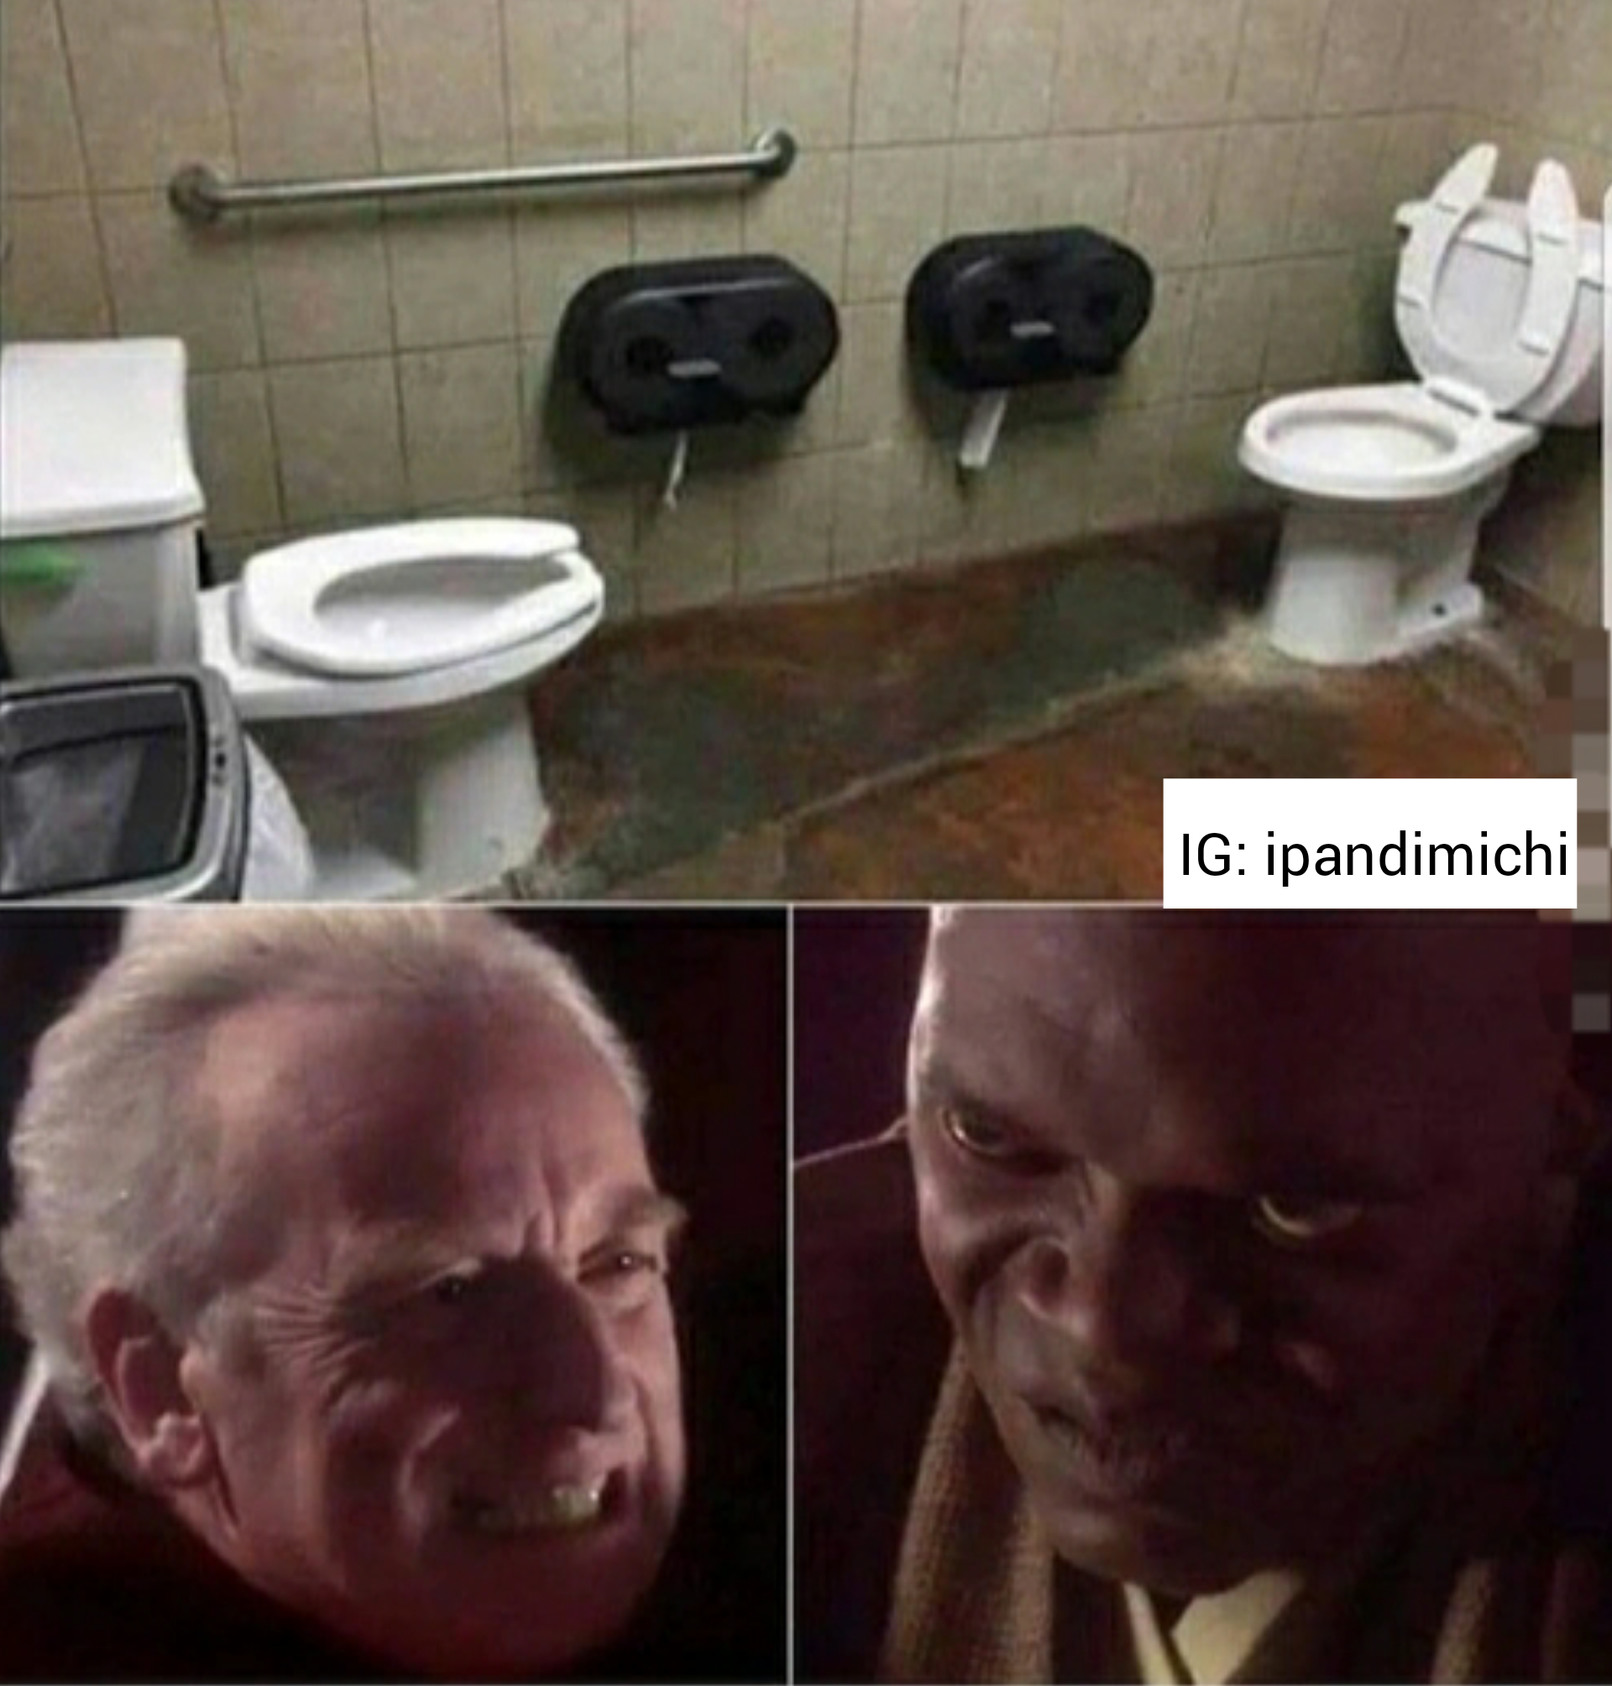 SI LOS BAÑOS FUERAN ASI JSJSA - meme